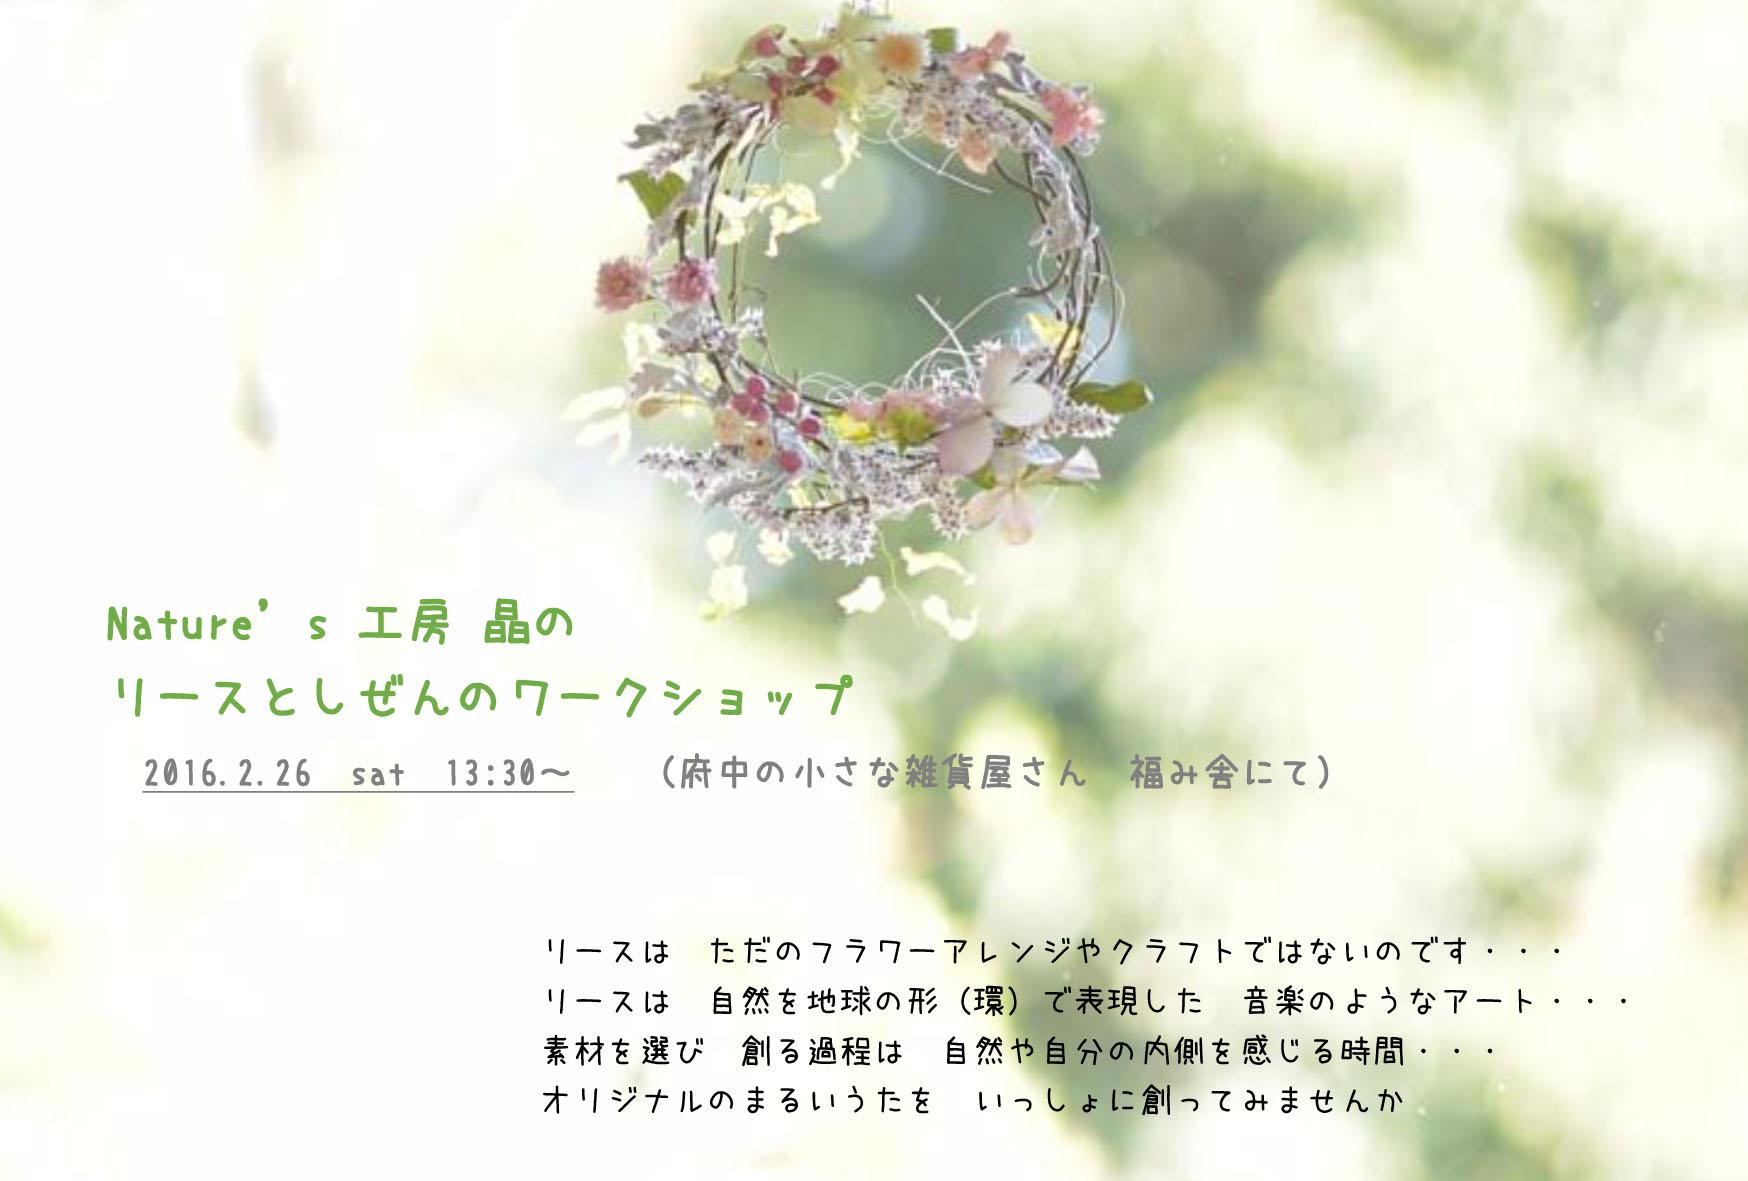 fukumiya_salon_201602-1.jpg